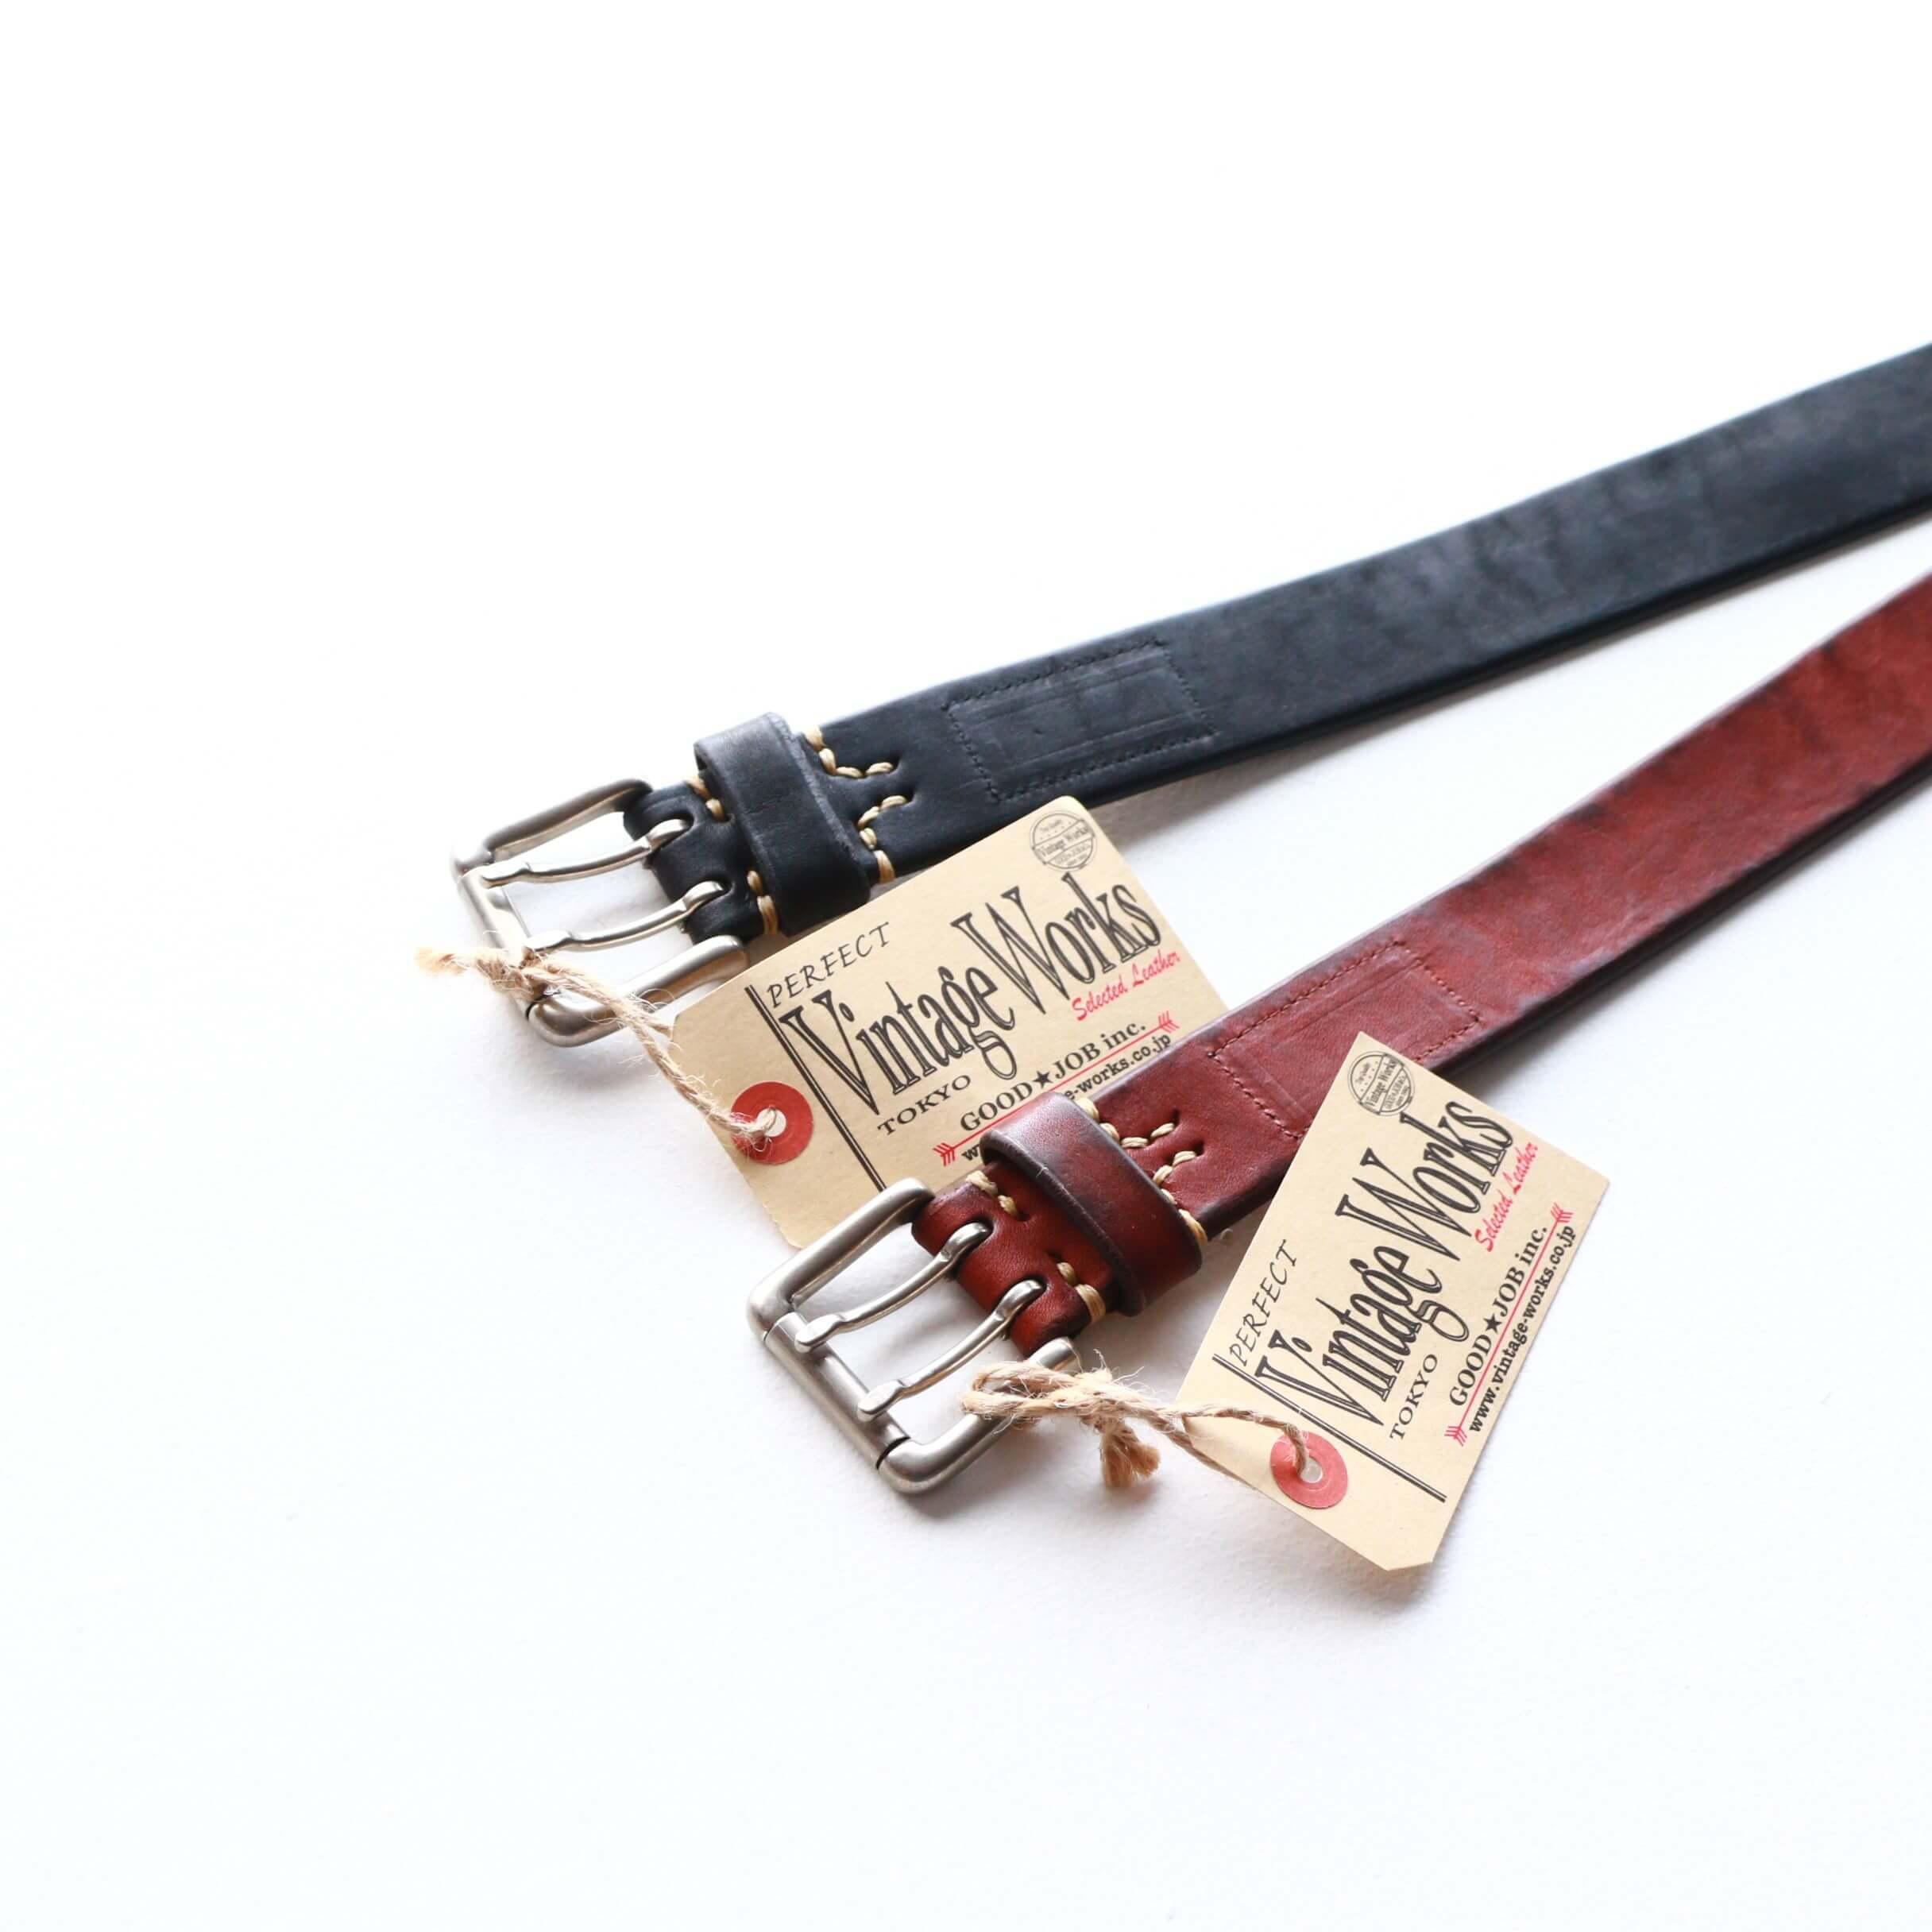 Vintage Works ヴィンテージワークス Leather belt 7Hole レザーベルト 7ホール DH5728